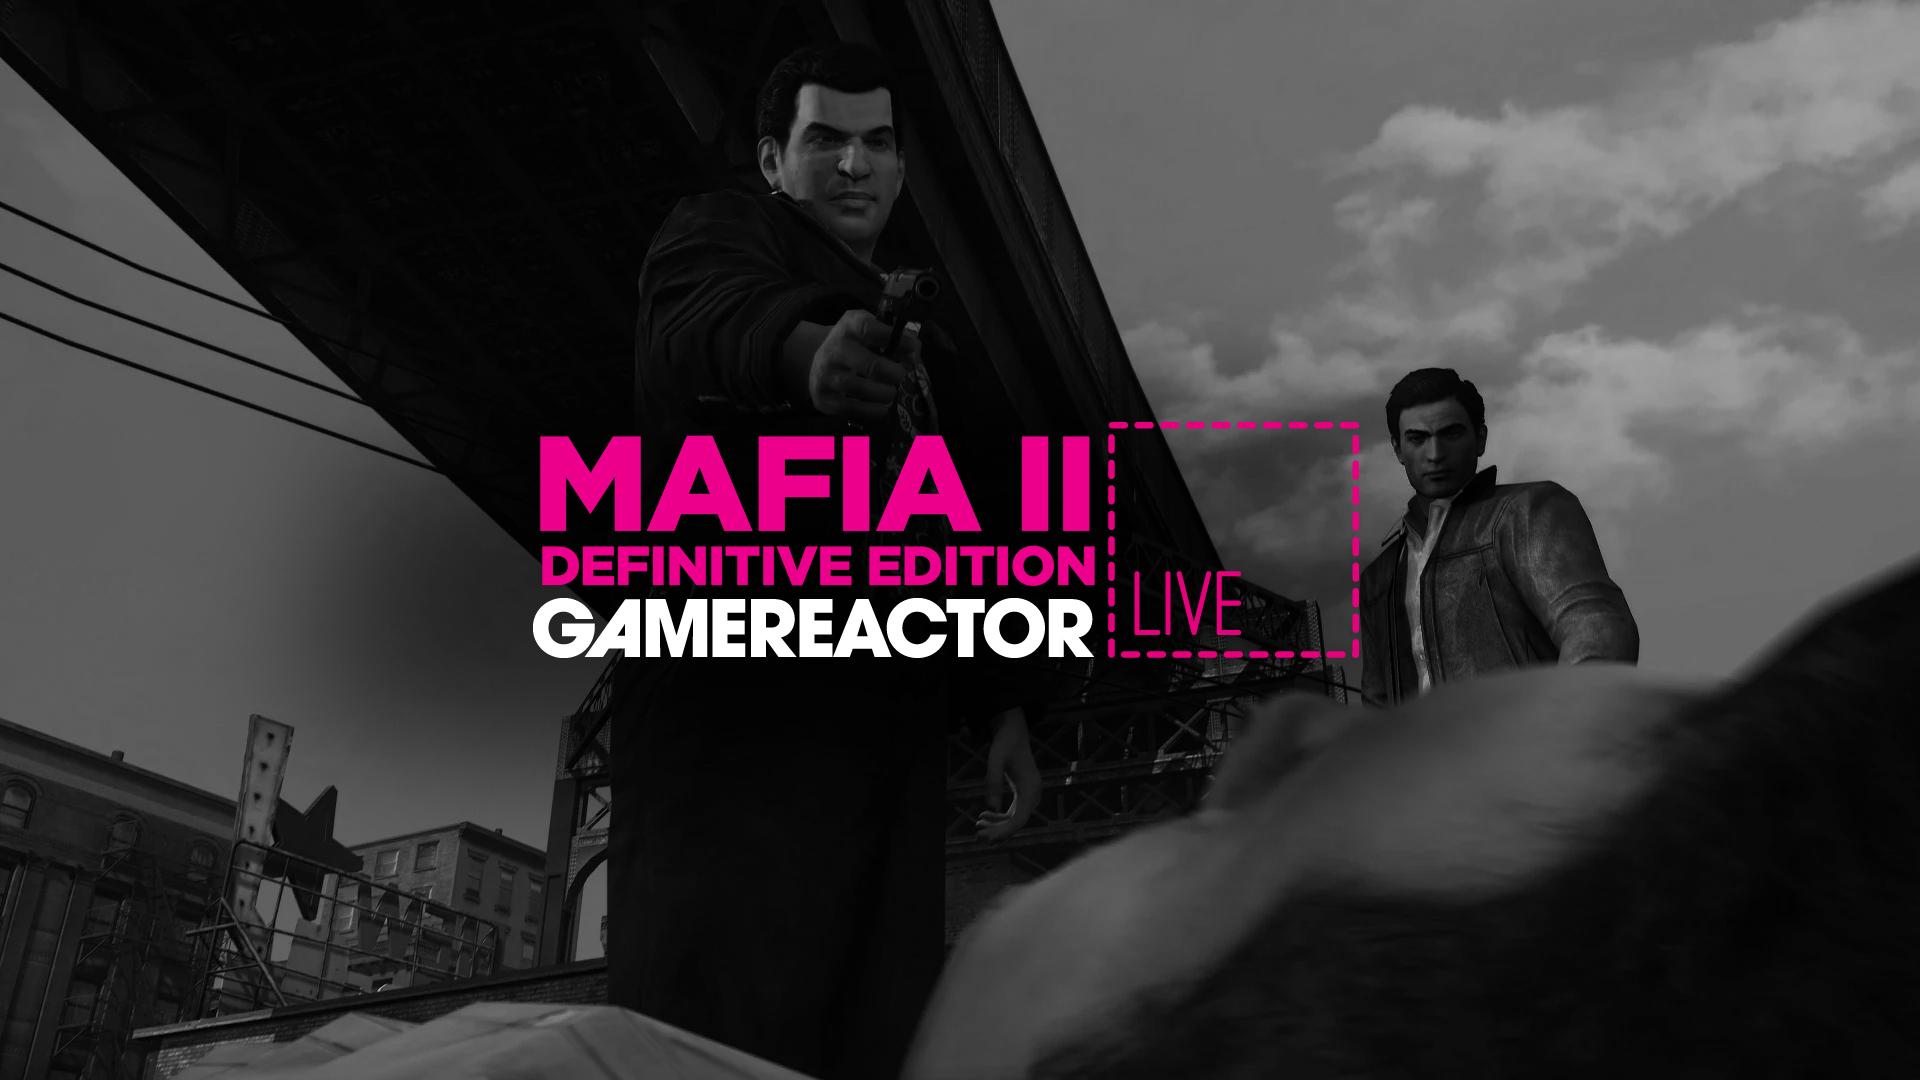 Gamereactor Live: Vi leker gangsterboss i Mafia II: Definitive Edition